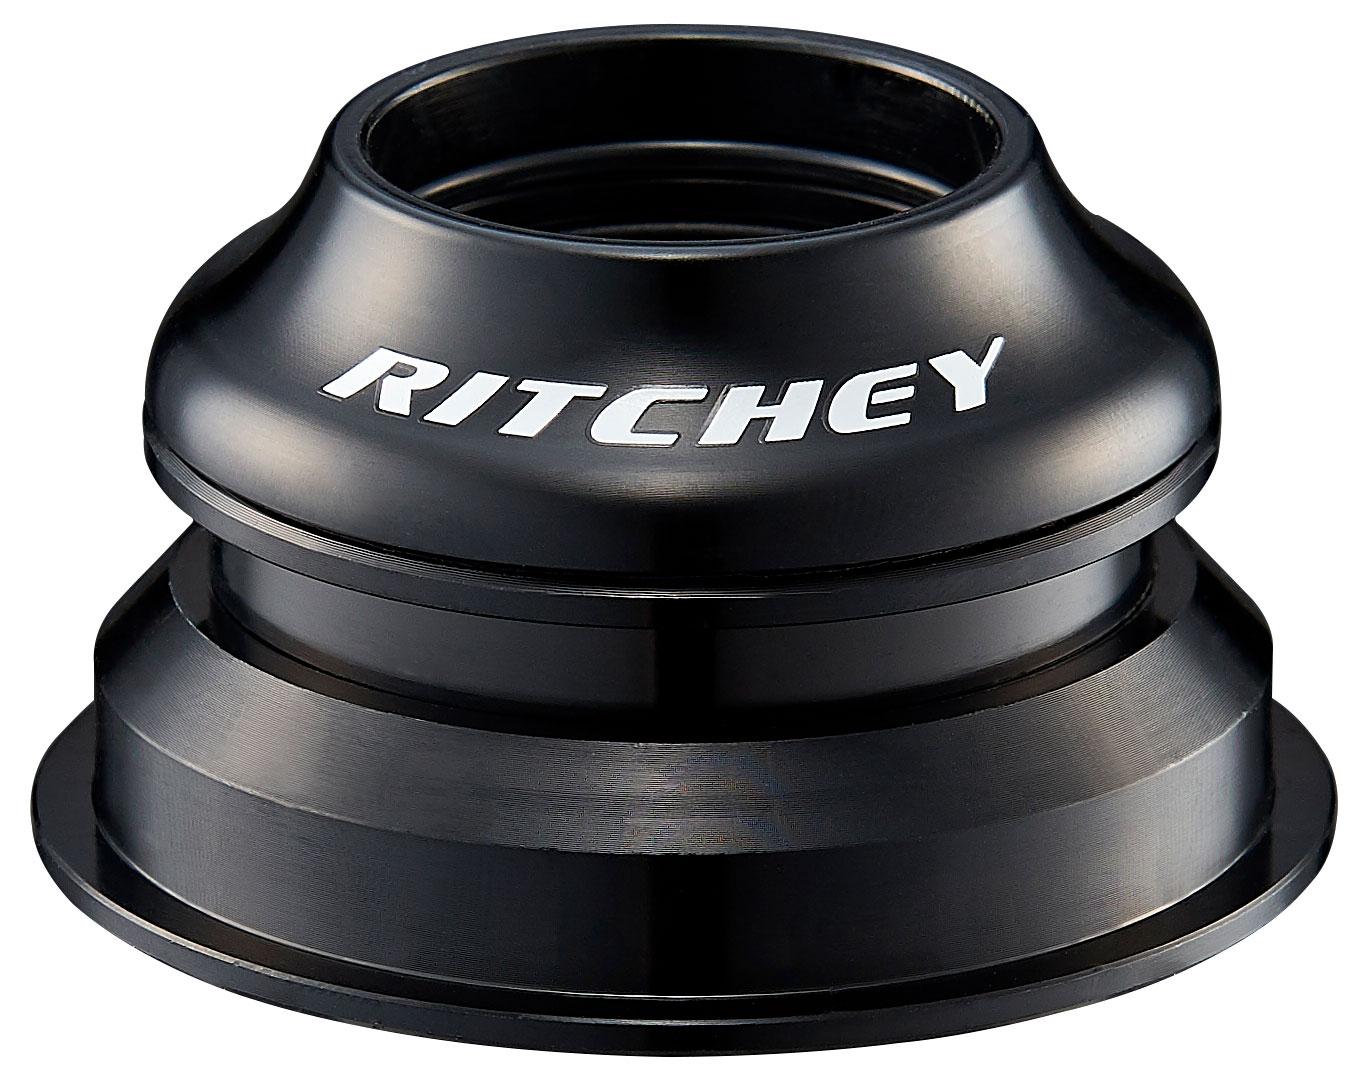 Kormcsapágy RITCHEY COMP PRESS-FIT TAPER ZS44/28.6 ZS56/40